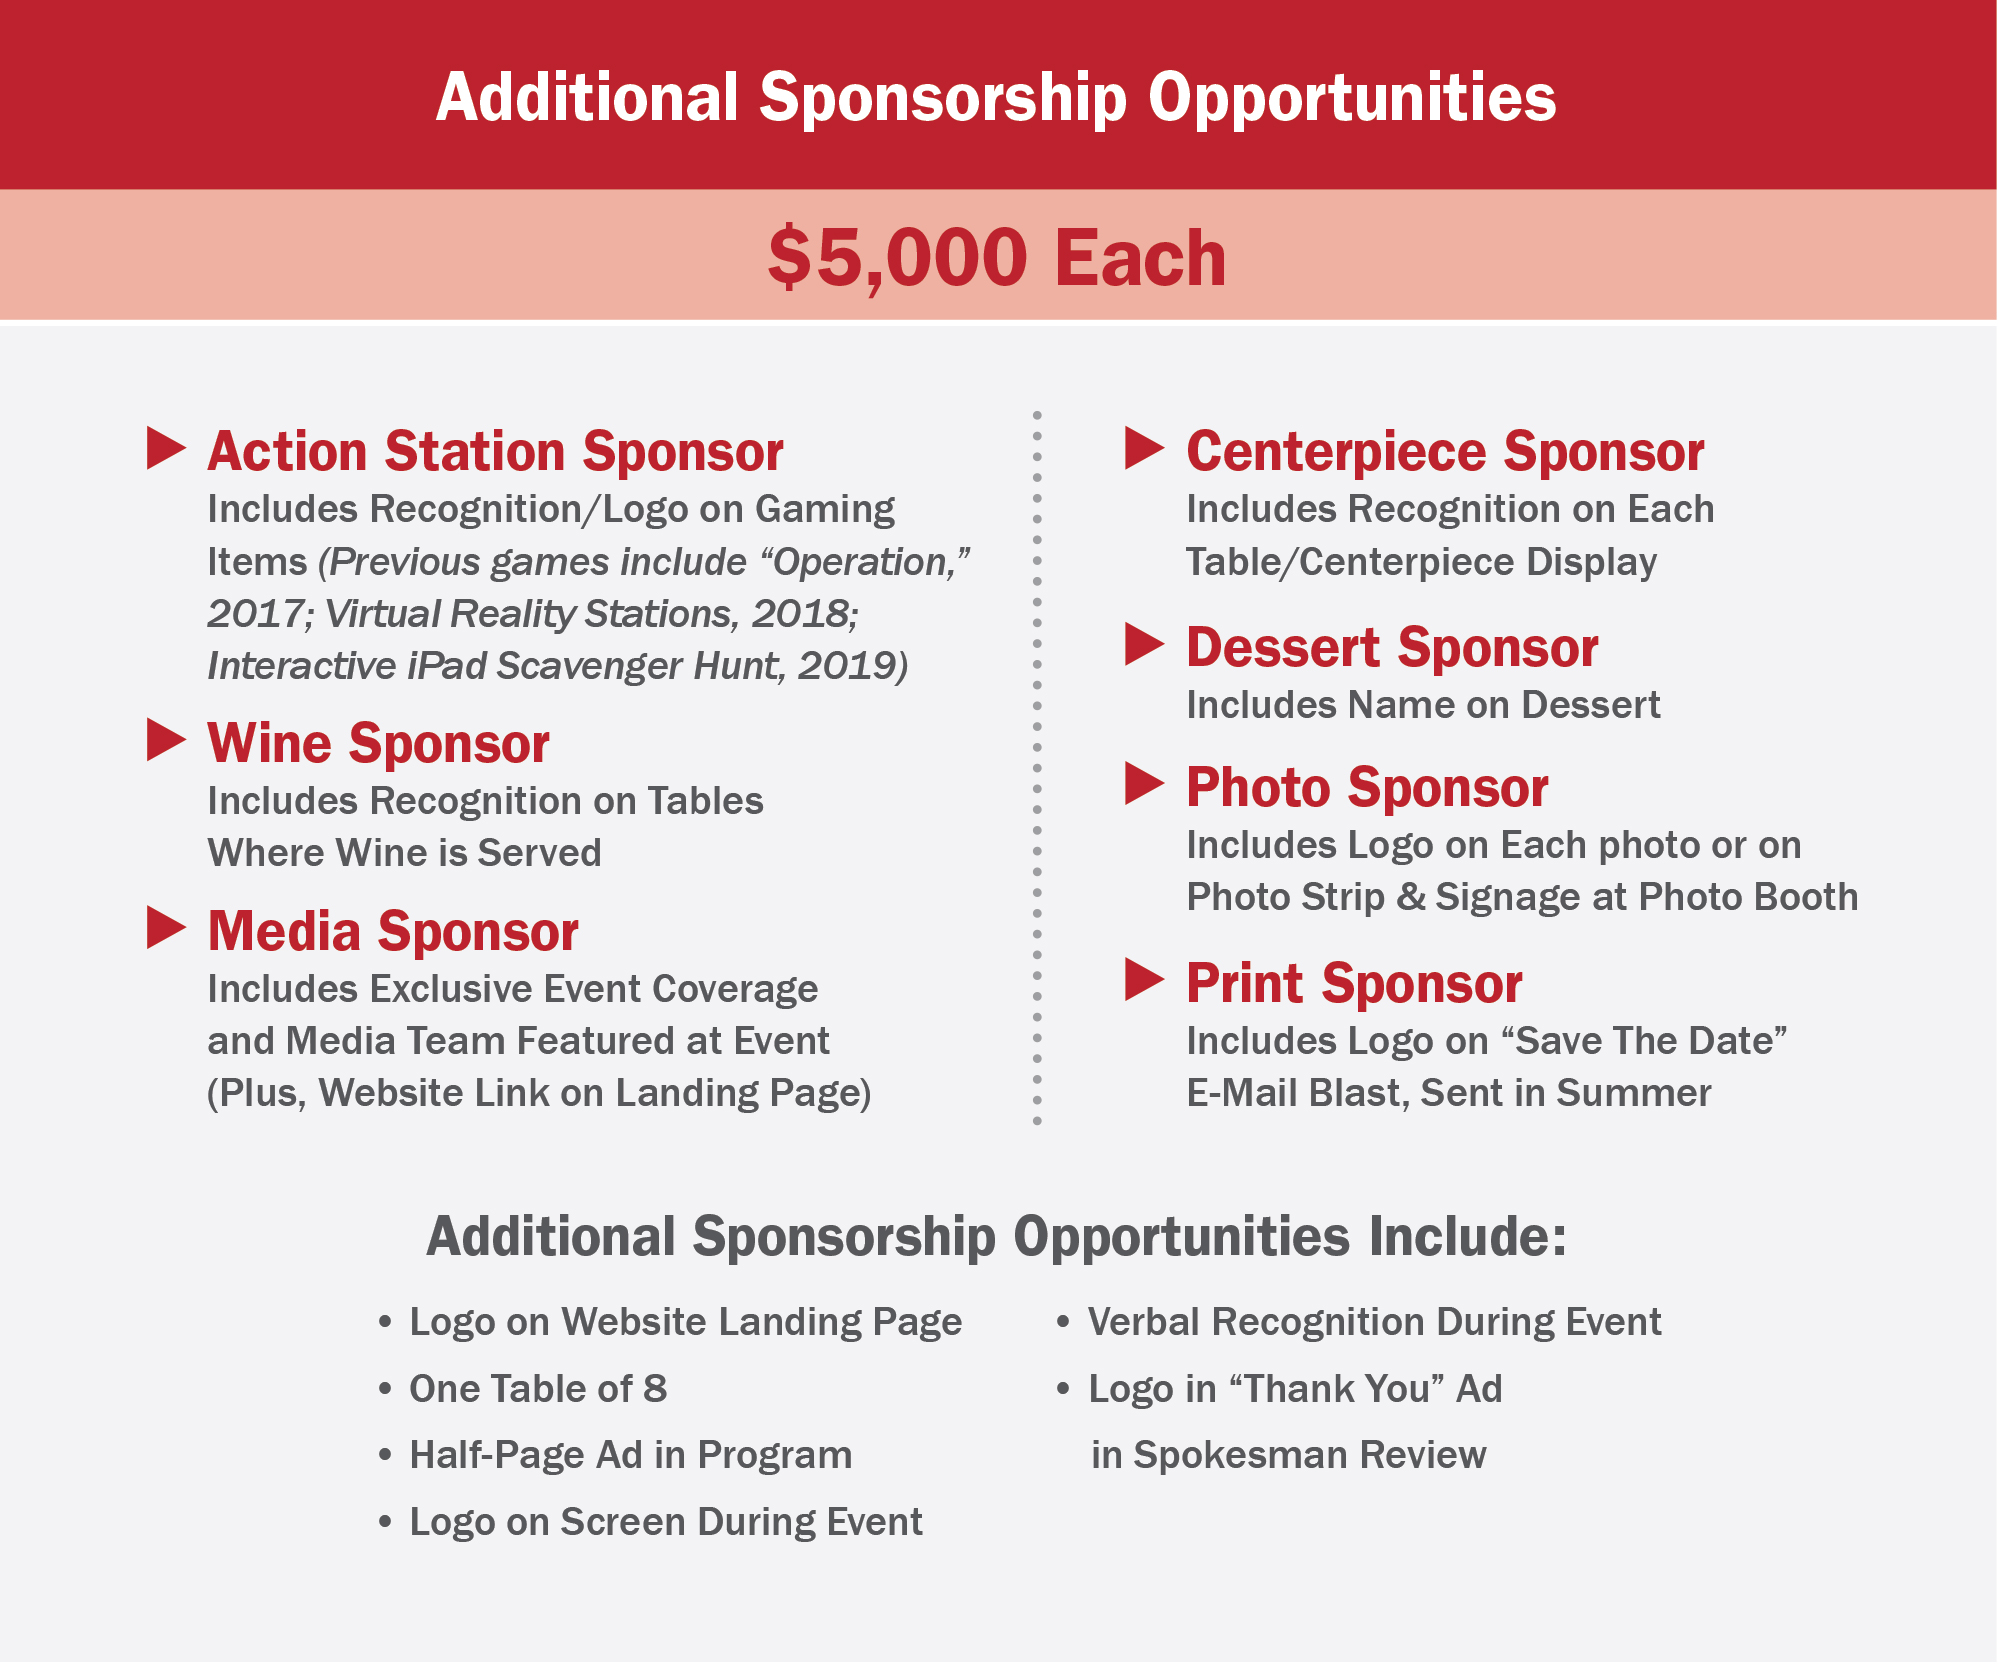 Additional sponsorship opportunities (action, wine, media, centerpiece, dessert, photo, print)